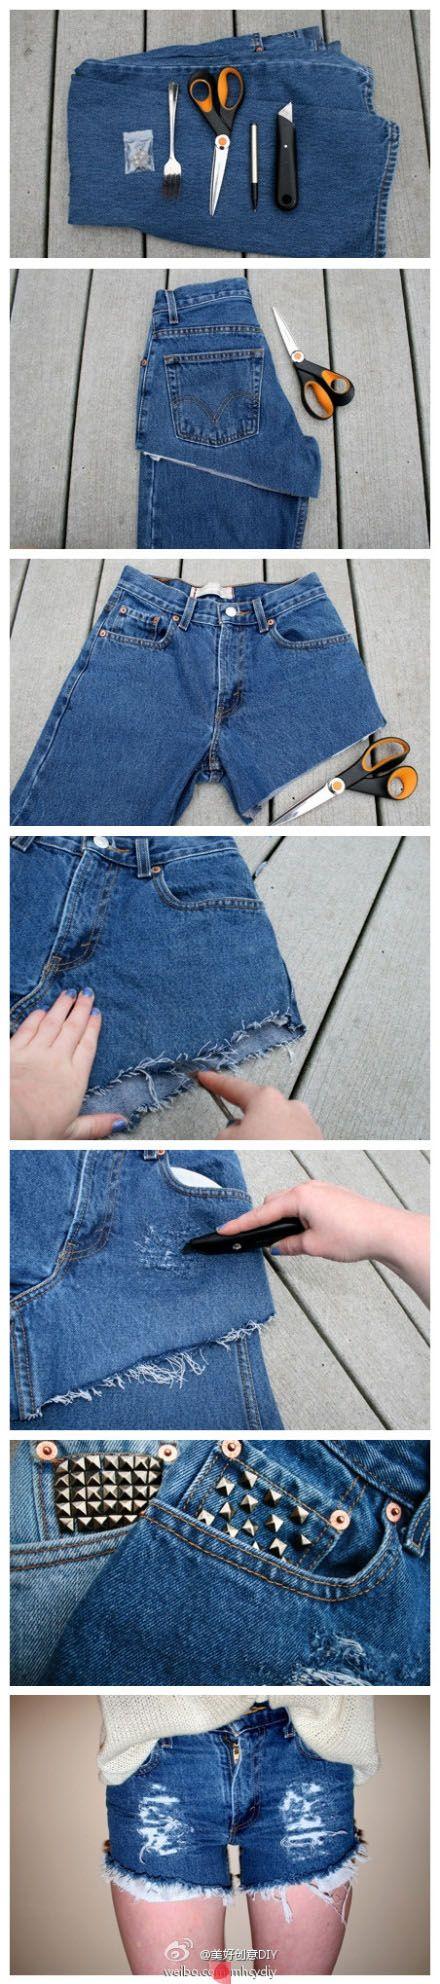 Jeans to shorts DIY. Lovebthe rough denim effect!